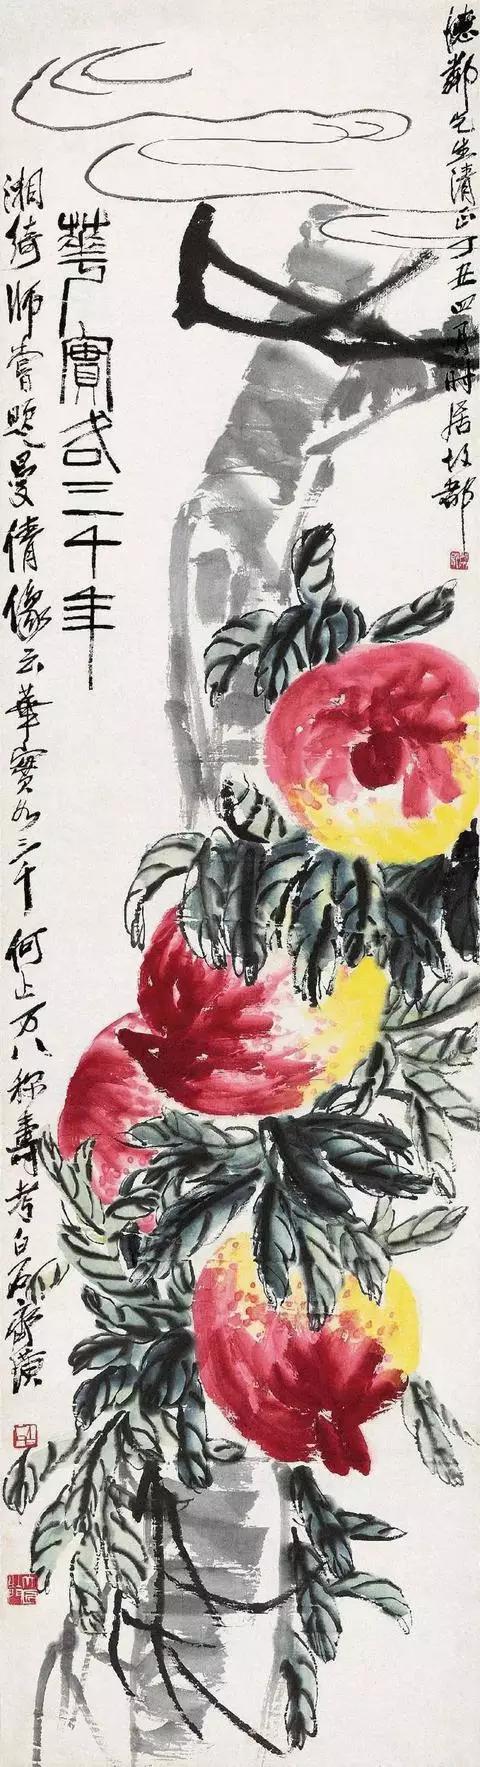 <b>齐白石 : 四个桃子3000万,世界上最贵!!</b>